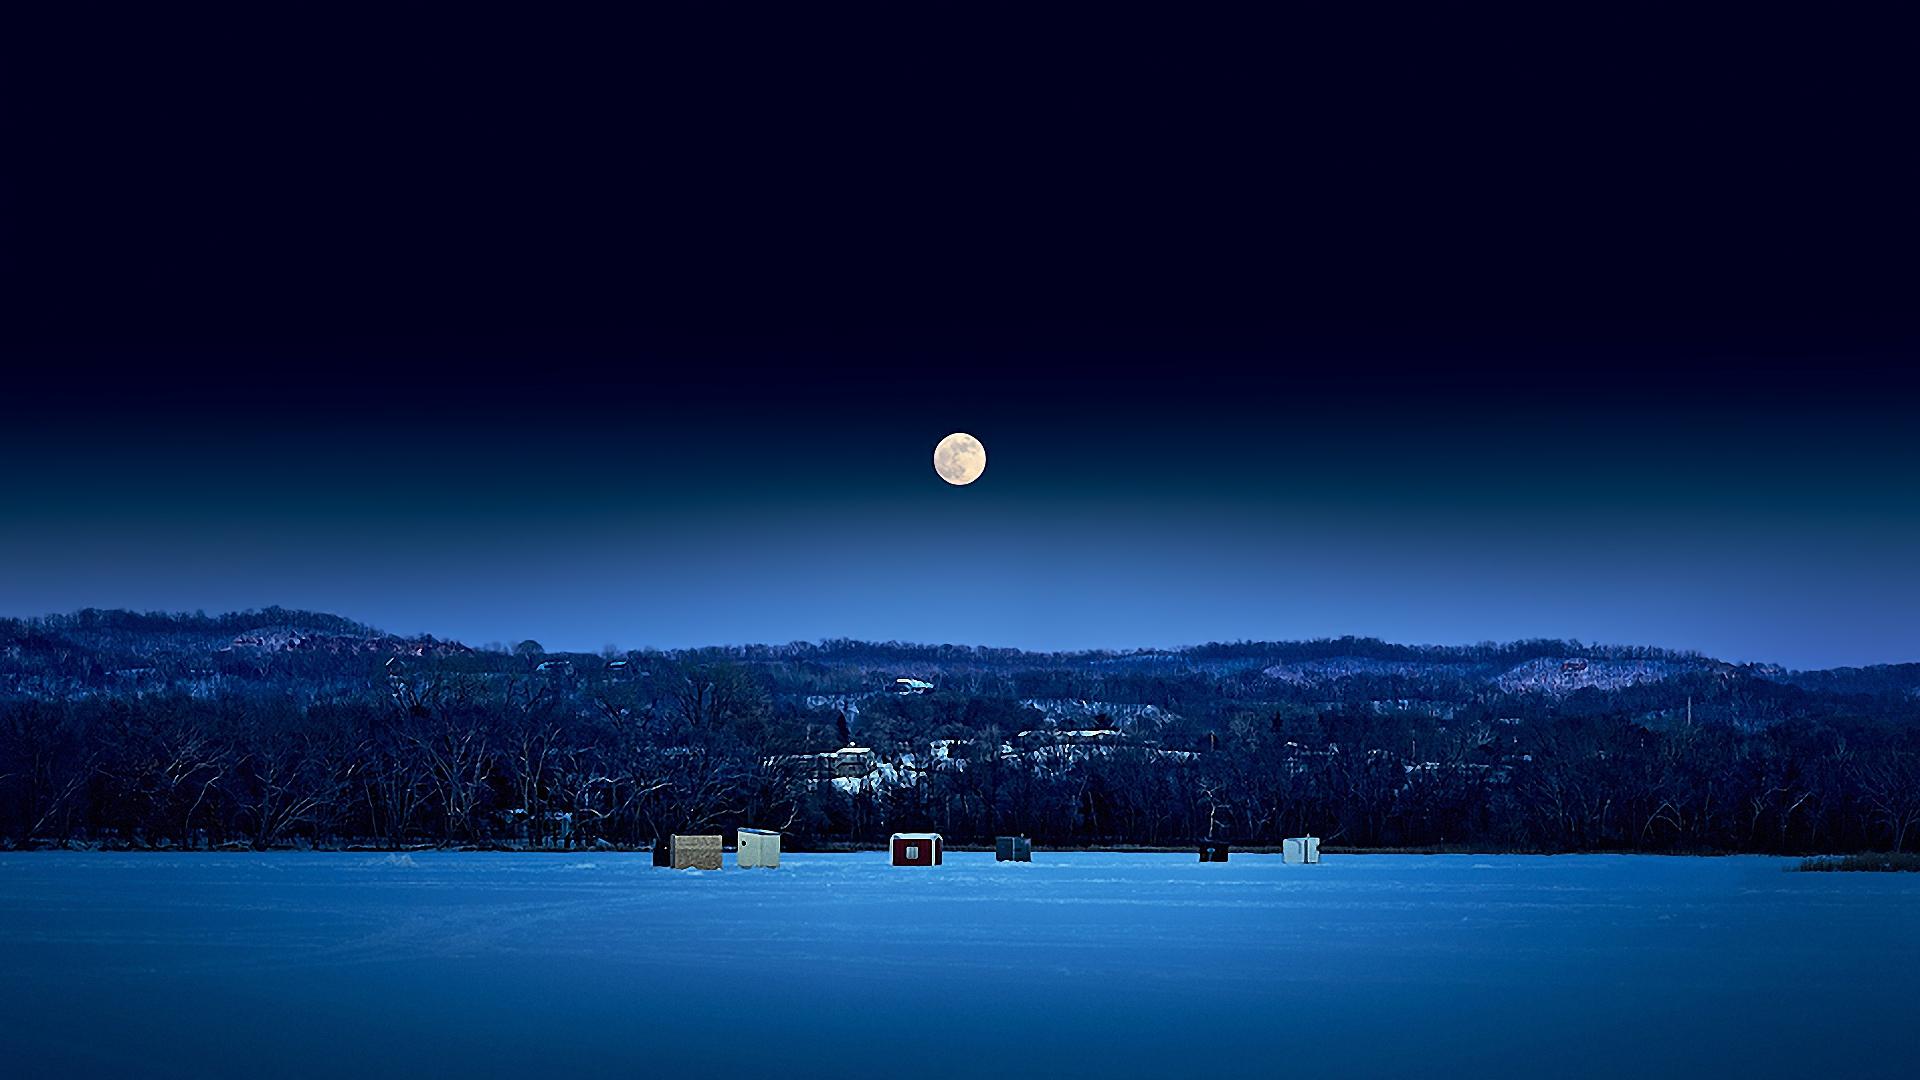 Wallpaper Full Moon Night Sky Ice Constructions 1920x1080